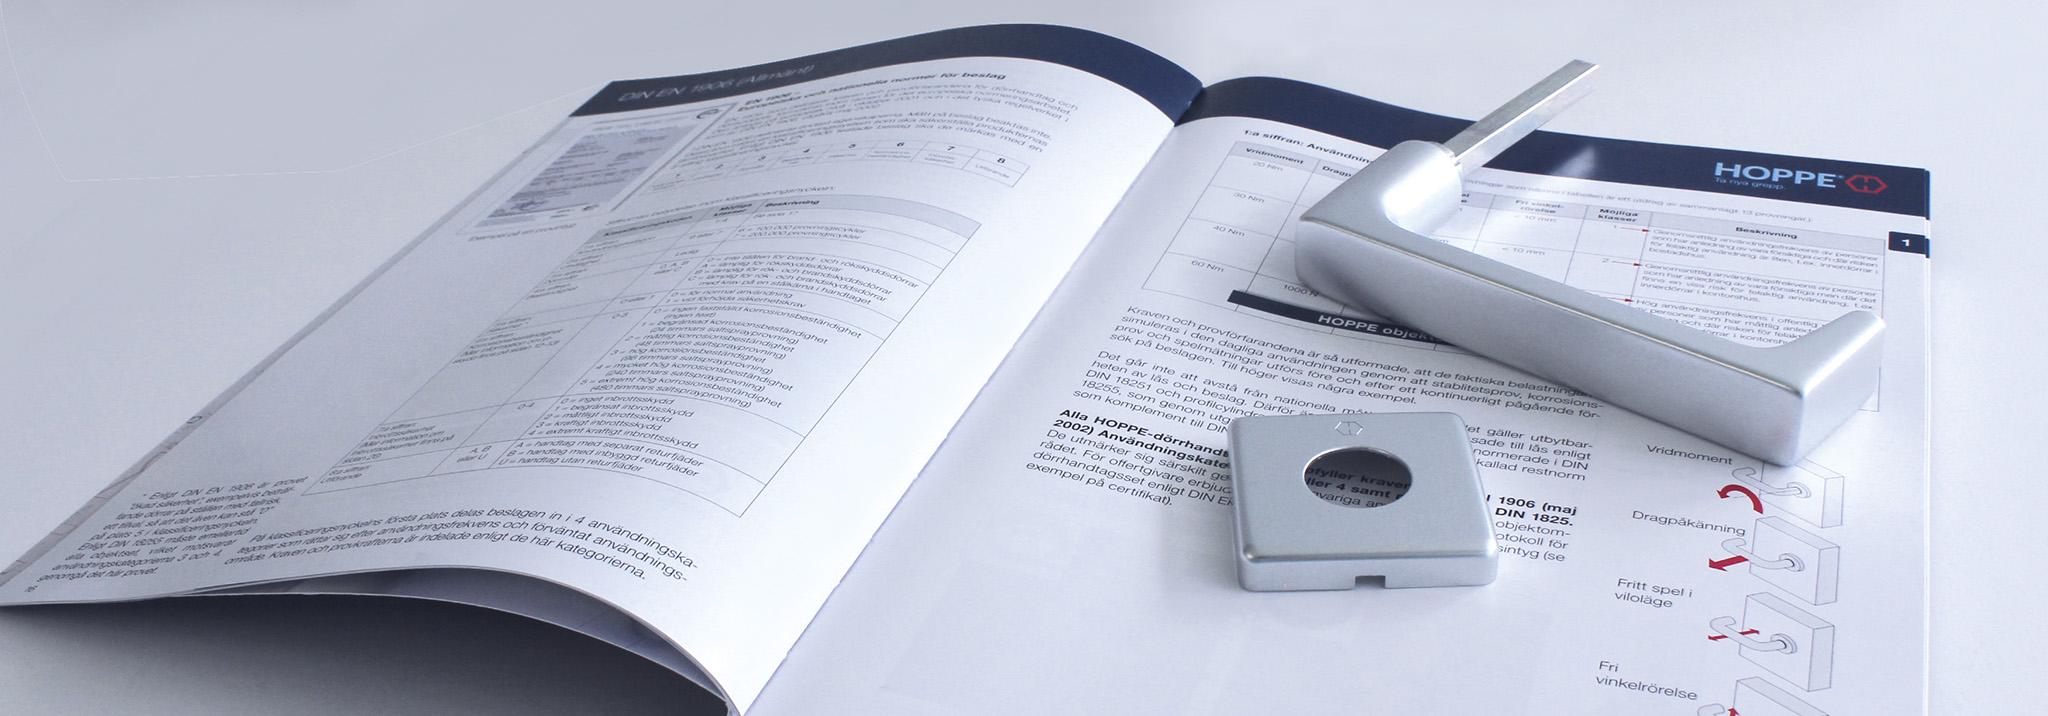 DoP (Declaration of Performance) Certificates